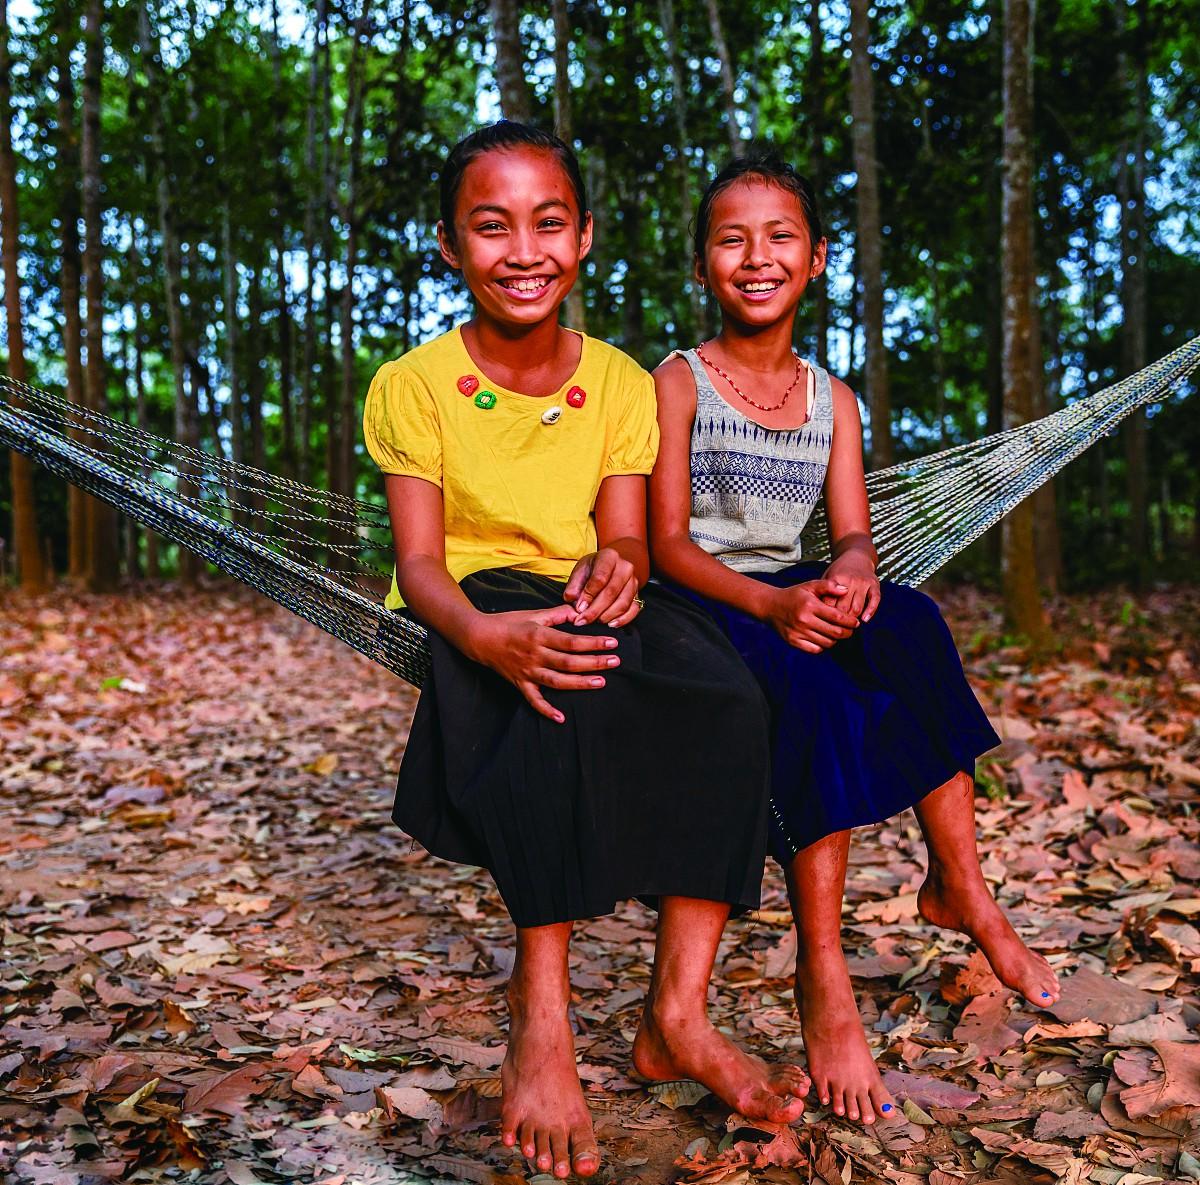 吊床,柬埔寨人的梦乐园